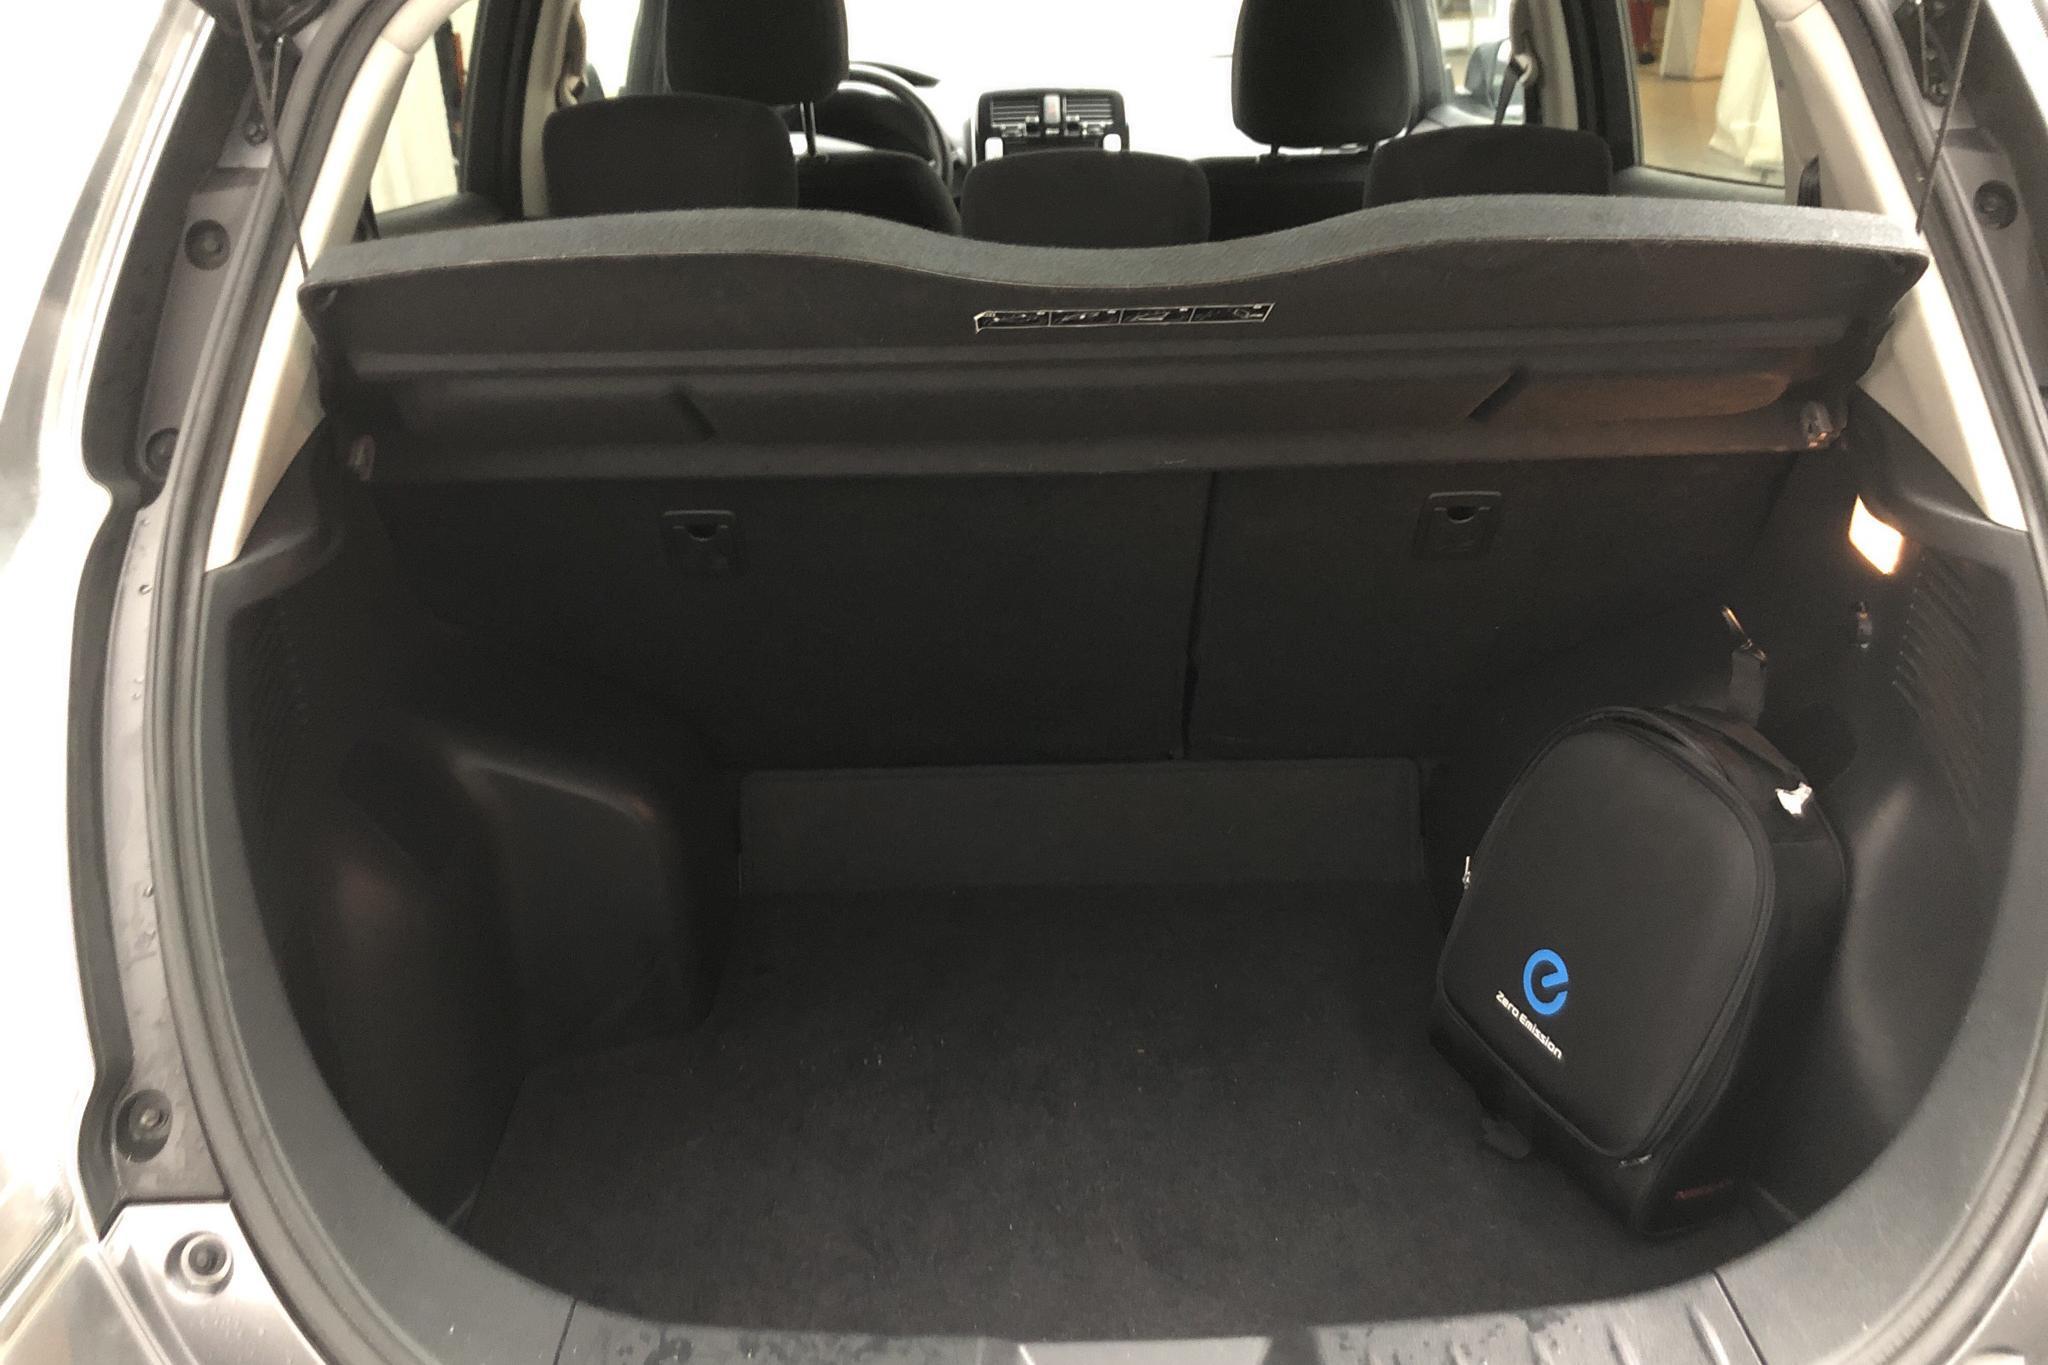 Nissan LEAF 5dr (109hk) - 6 619 mil - Automat - grå - 2017